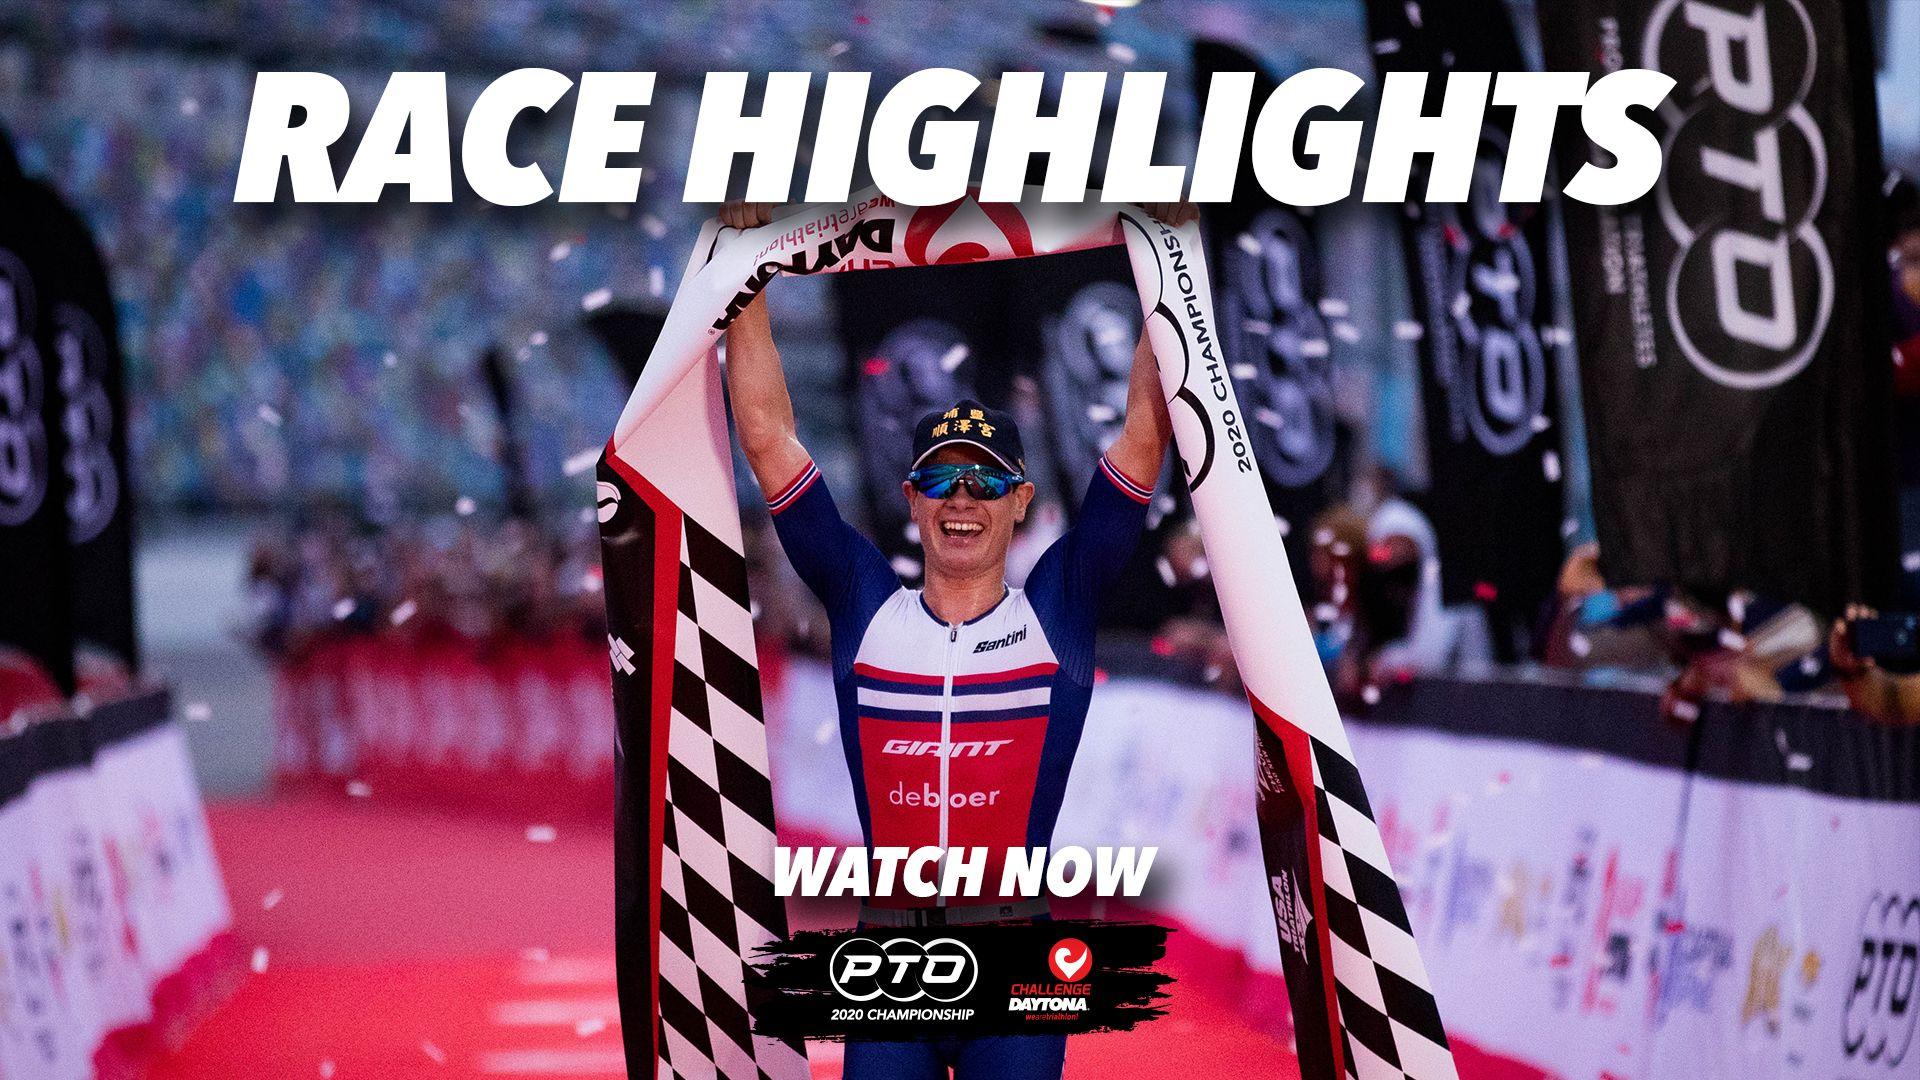 PTO 2020 Championship at Challenge Daytona   Race Highlights